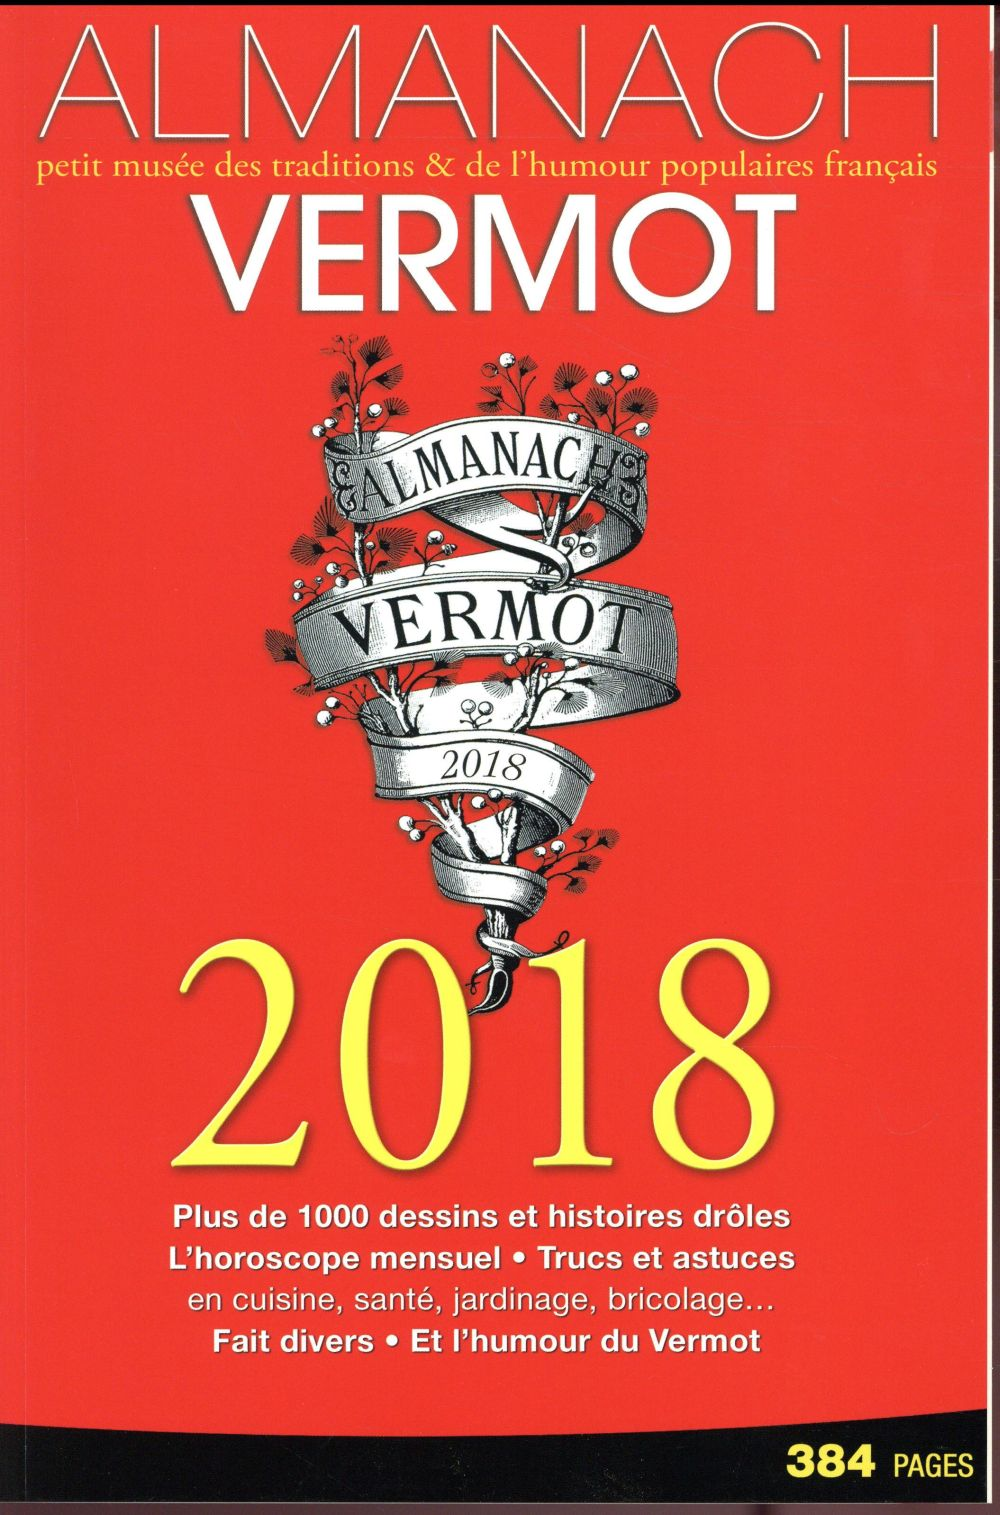 Almanach vermot